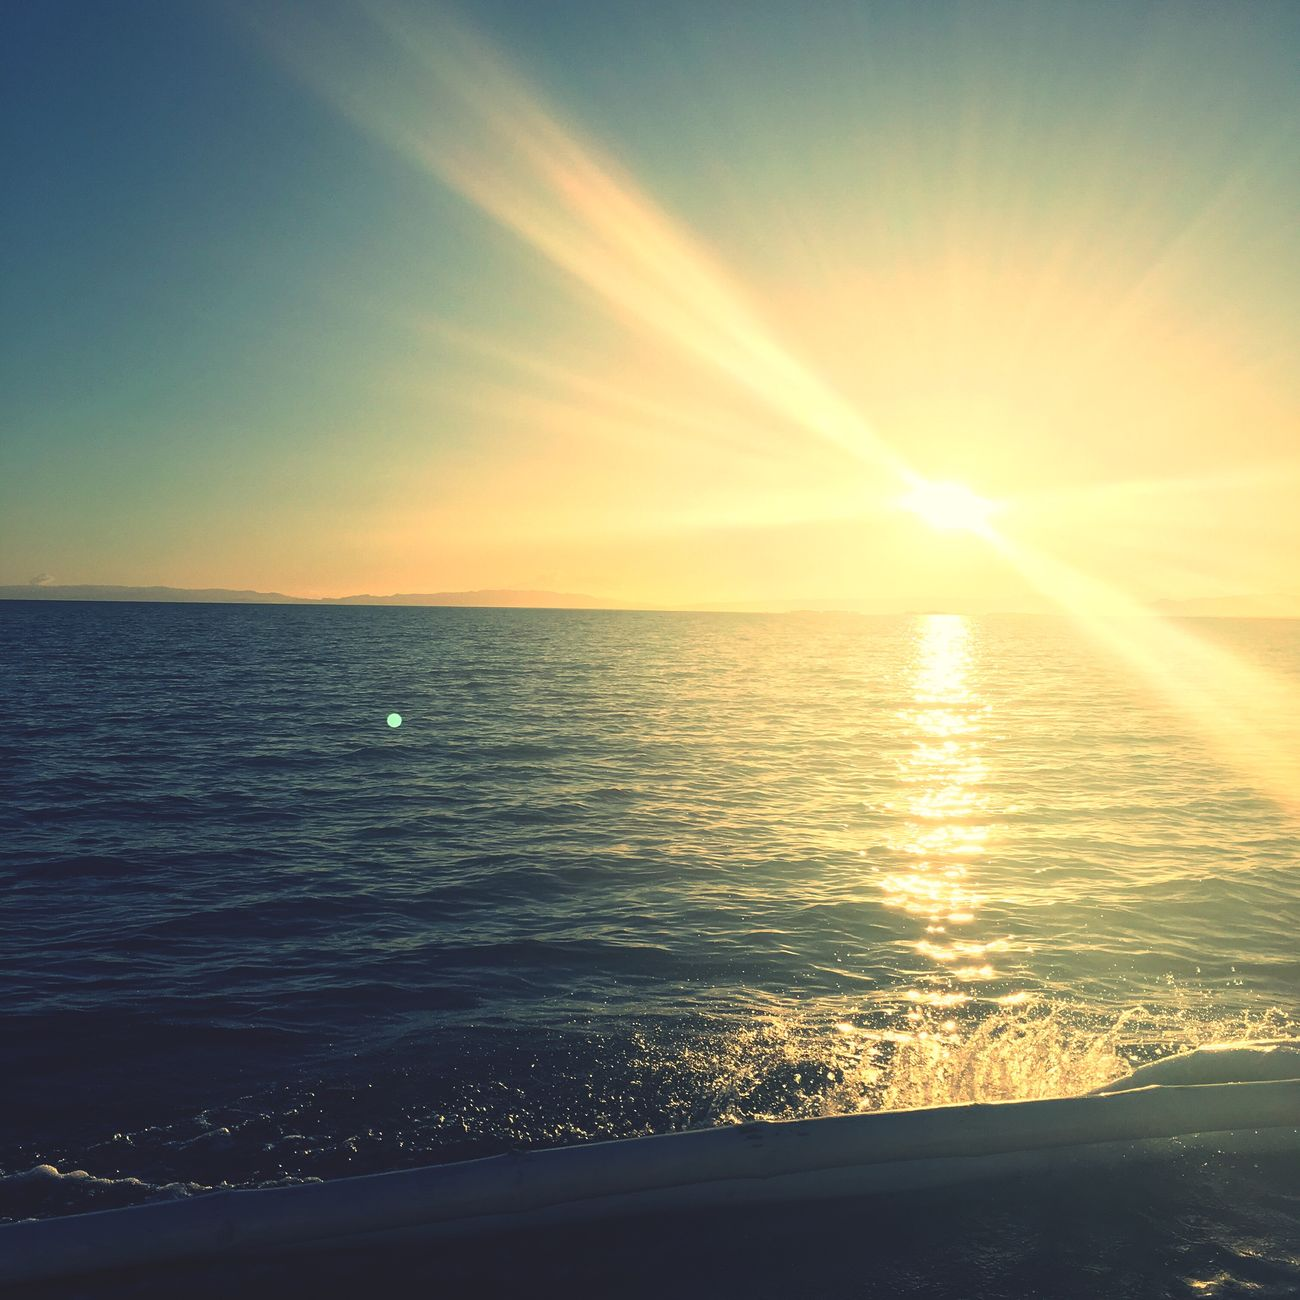 Chasing sunsets.. ⛅️🌊 Relaxing Enjoying Life